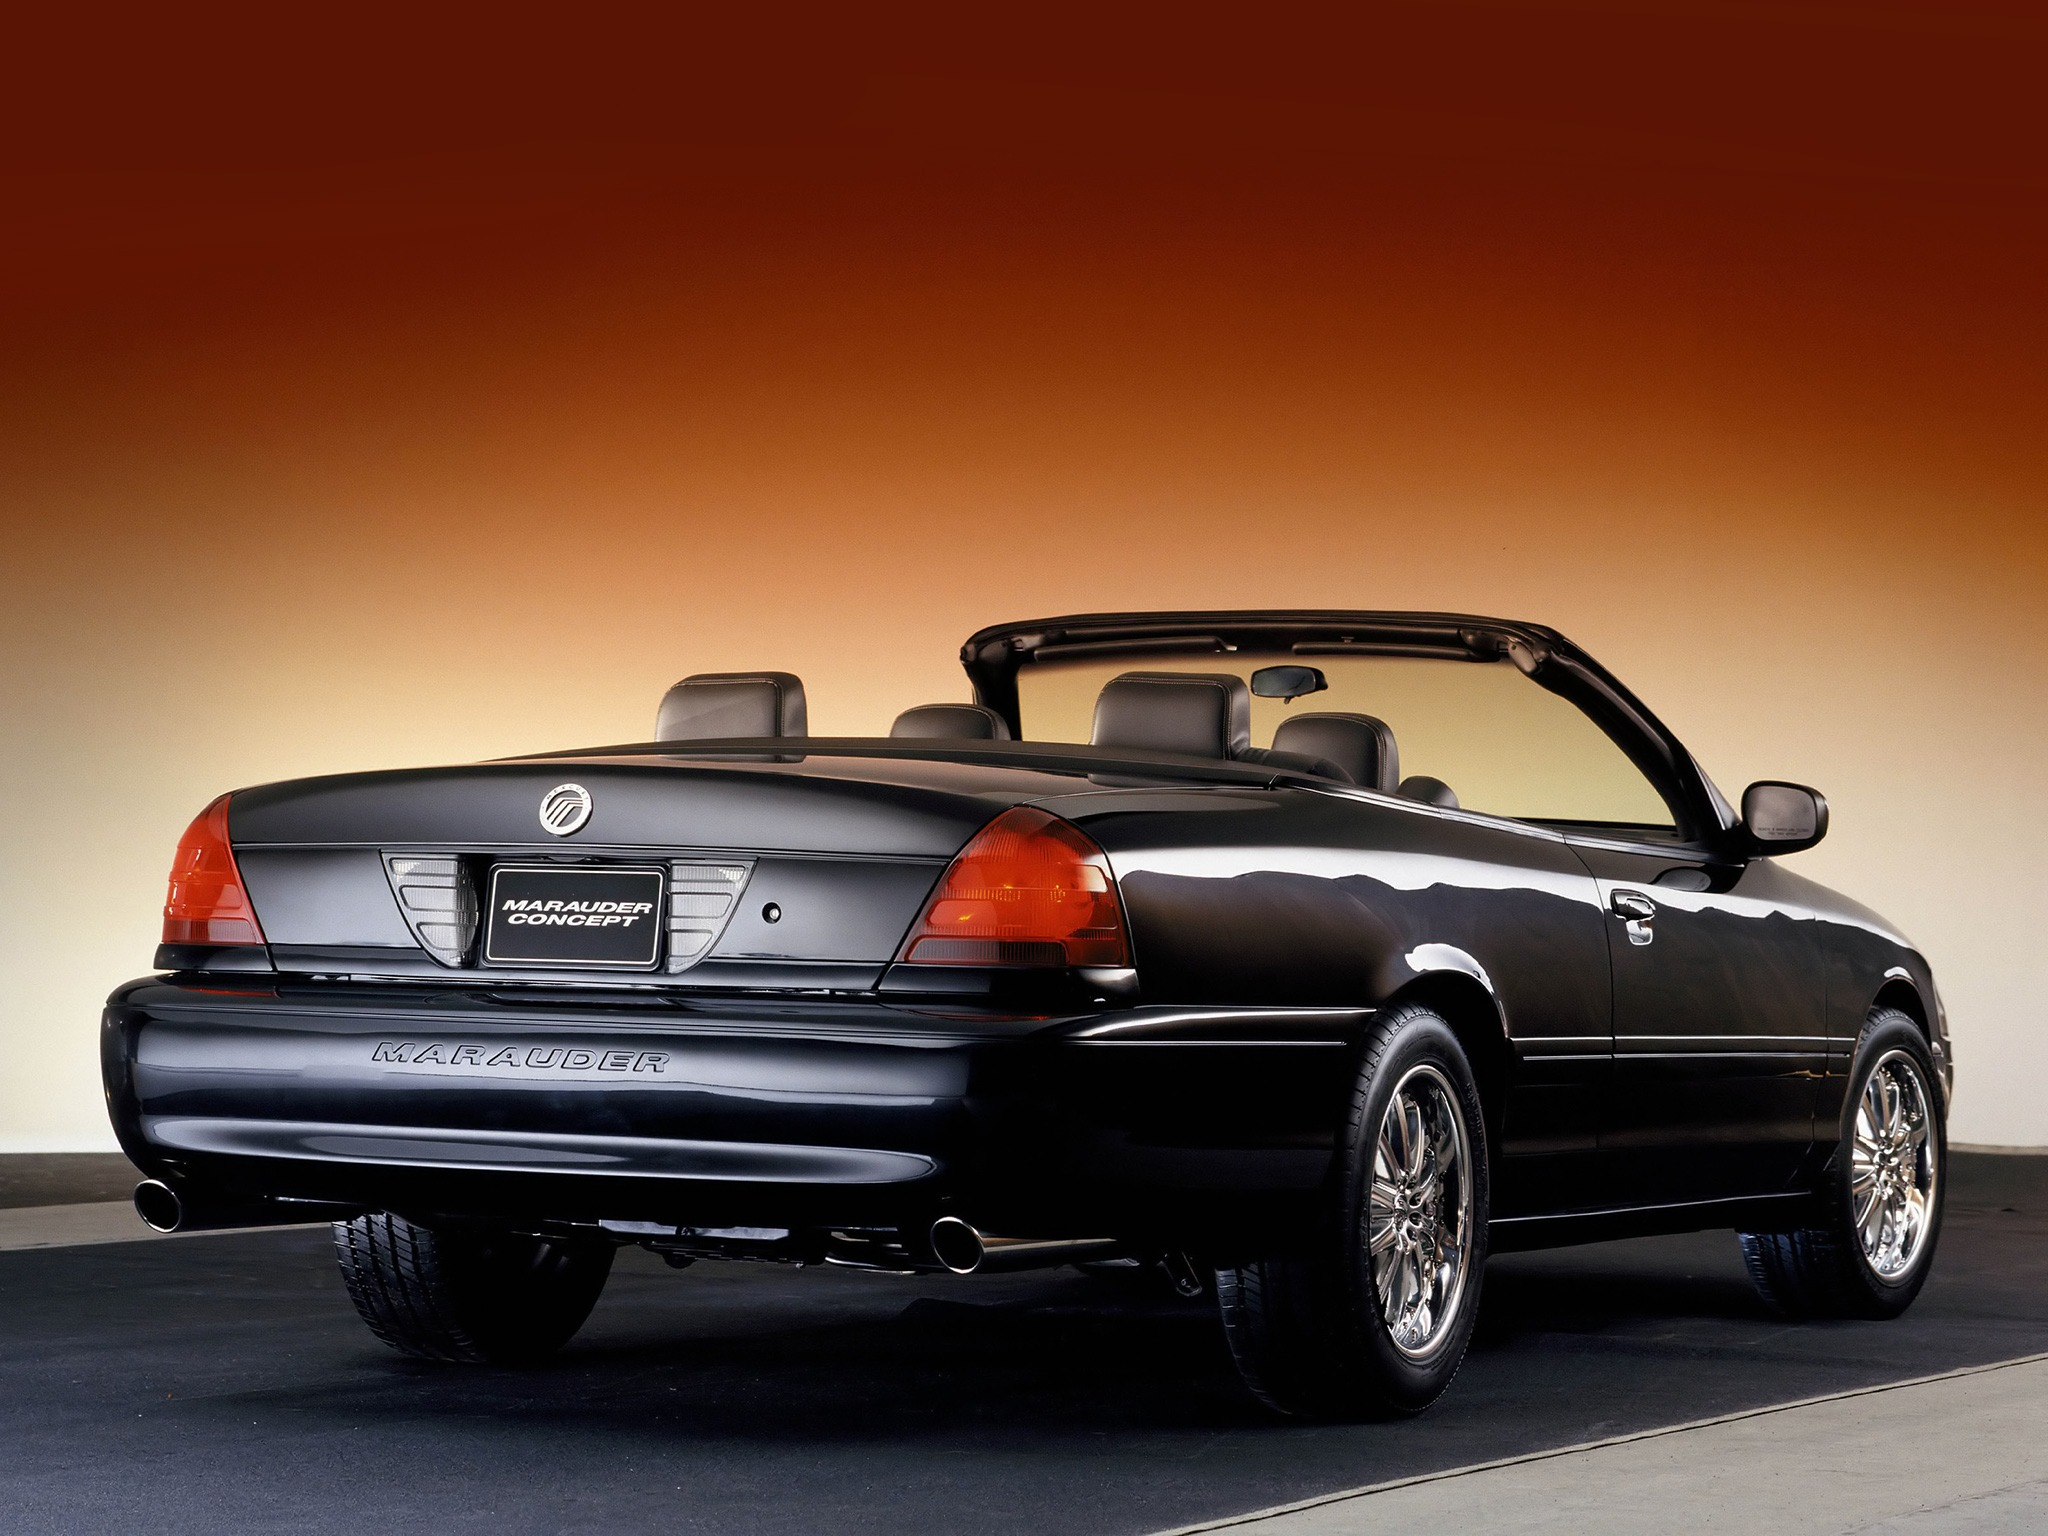 mercury marauder convertible concept 2002 old concept cars. Black Bedroom Furniture Sets. Home Design Ideas